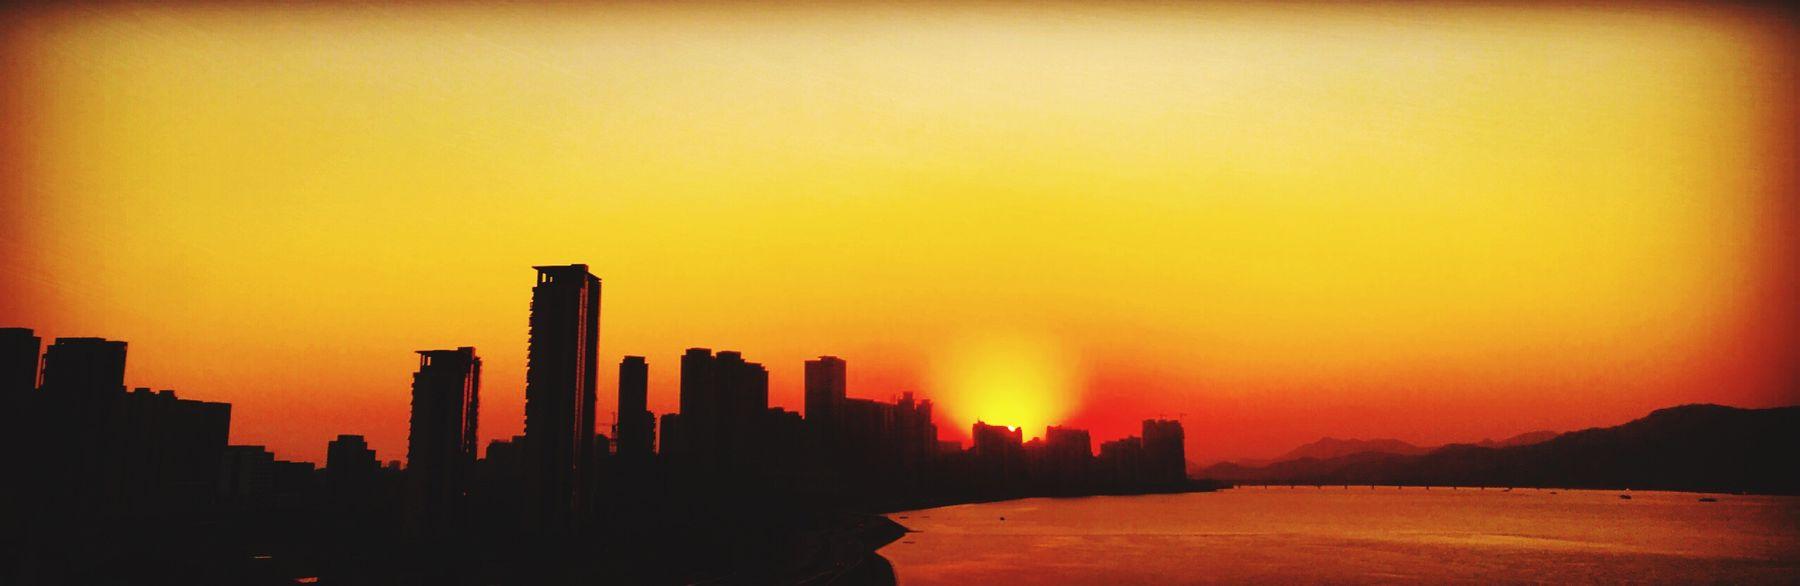 The setting sun (夕阳醉了) Setting Sun Dusk Hangzhou China IPhoneography Shots Zhejiang,China Enjoying Life First Eyeem Photo Lifestyle Snapshots Of Life Bridge